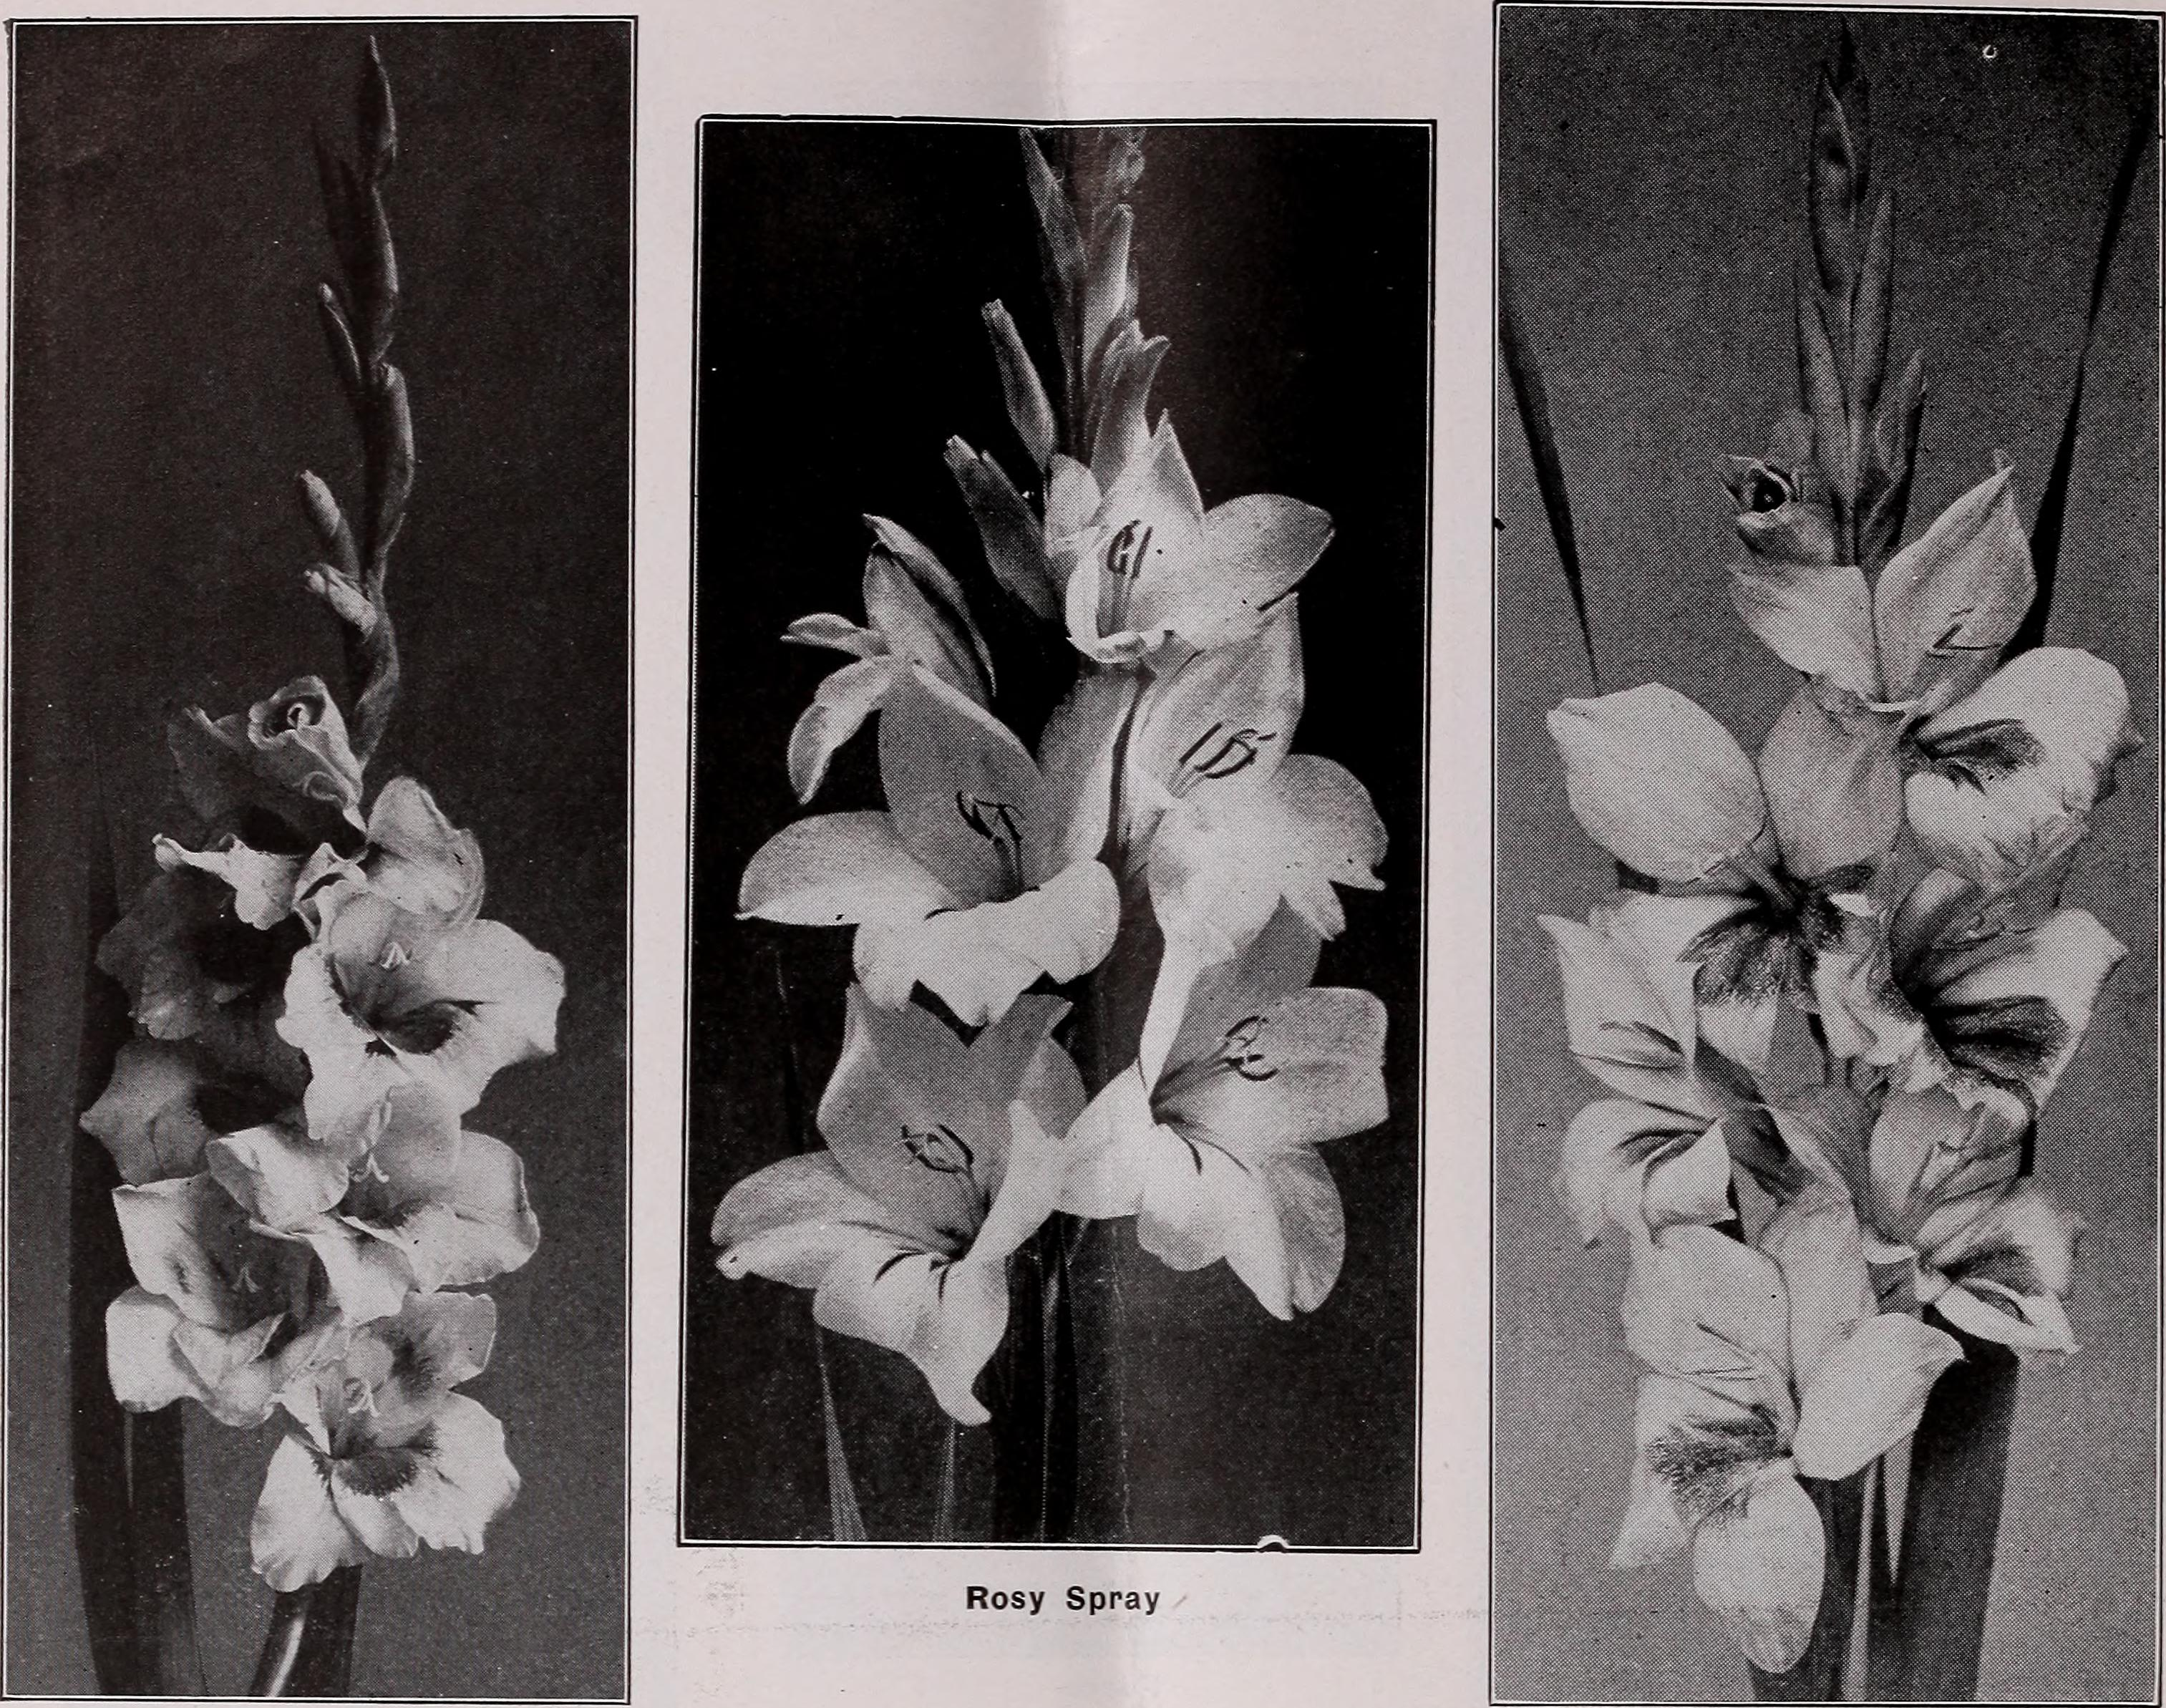 Fileseason of trade catalogue of choice gladioli and other summer fileseason of trade catalogue of choice gladioli and other summer flowering bulbs and mightylinksfo